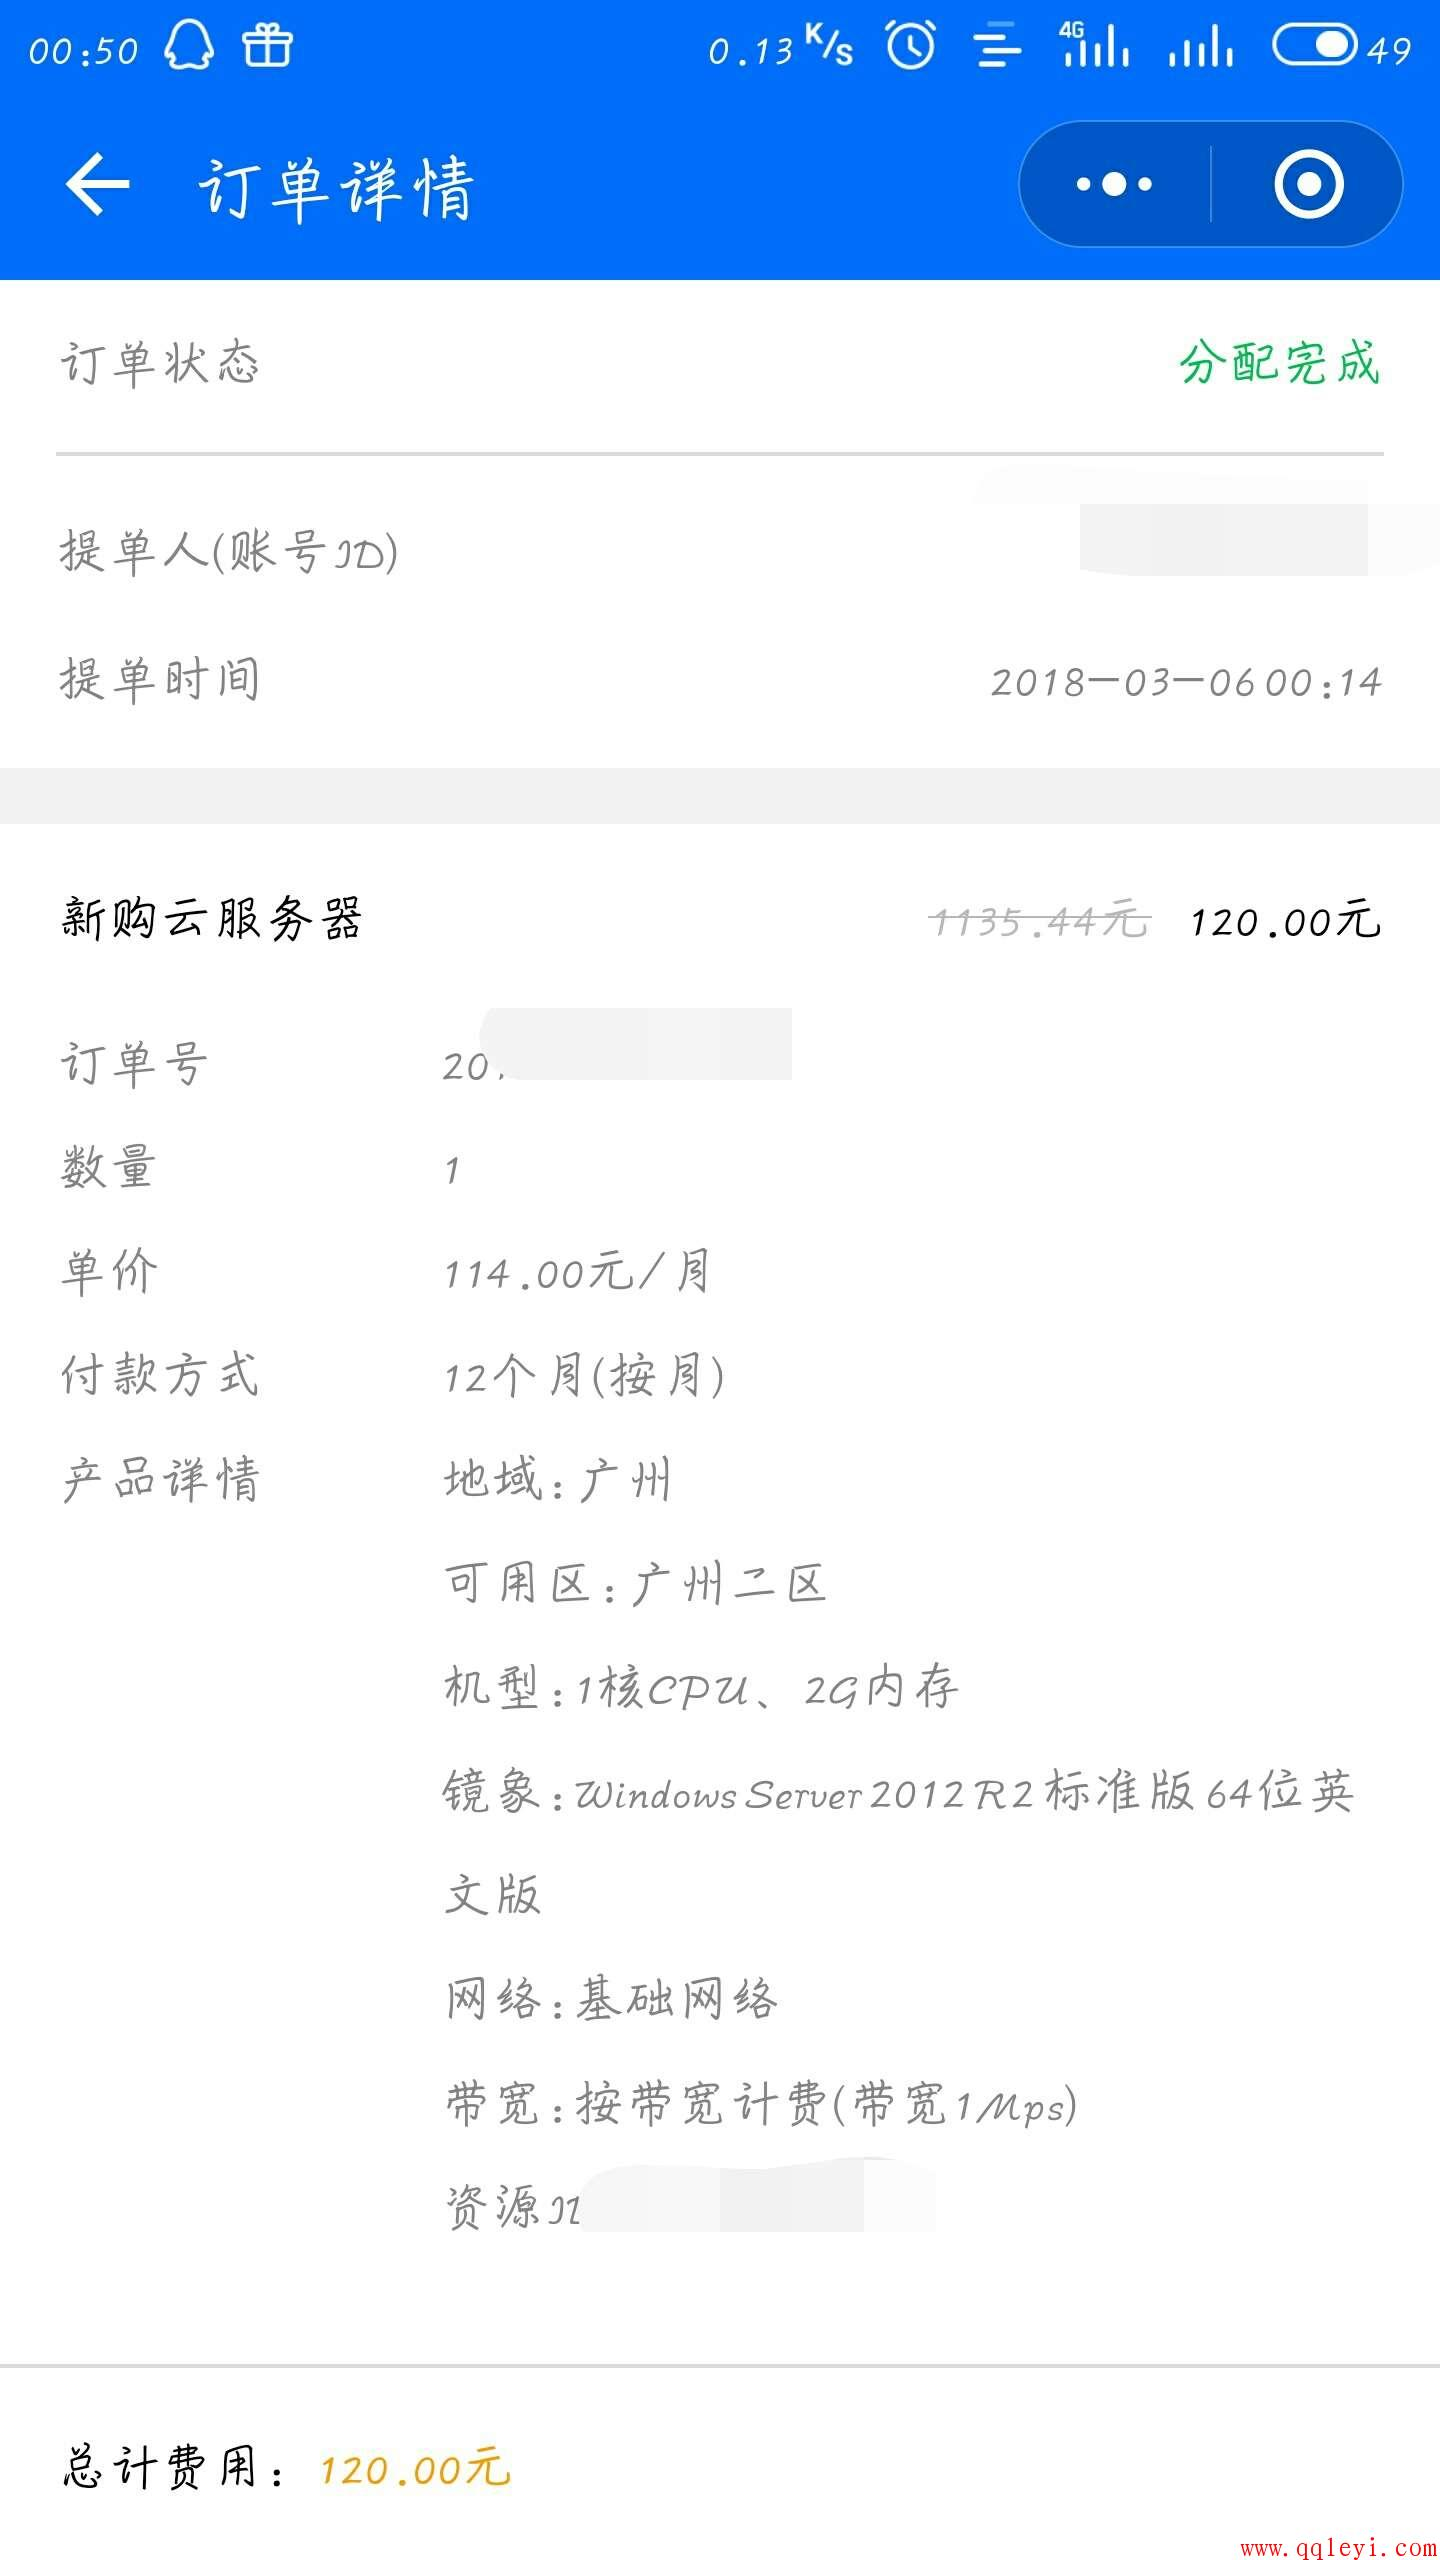 file-hash-jpg-a76c3530dd69f839b5a6ede5e262abaa132725.jpg